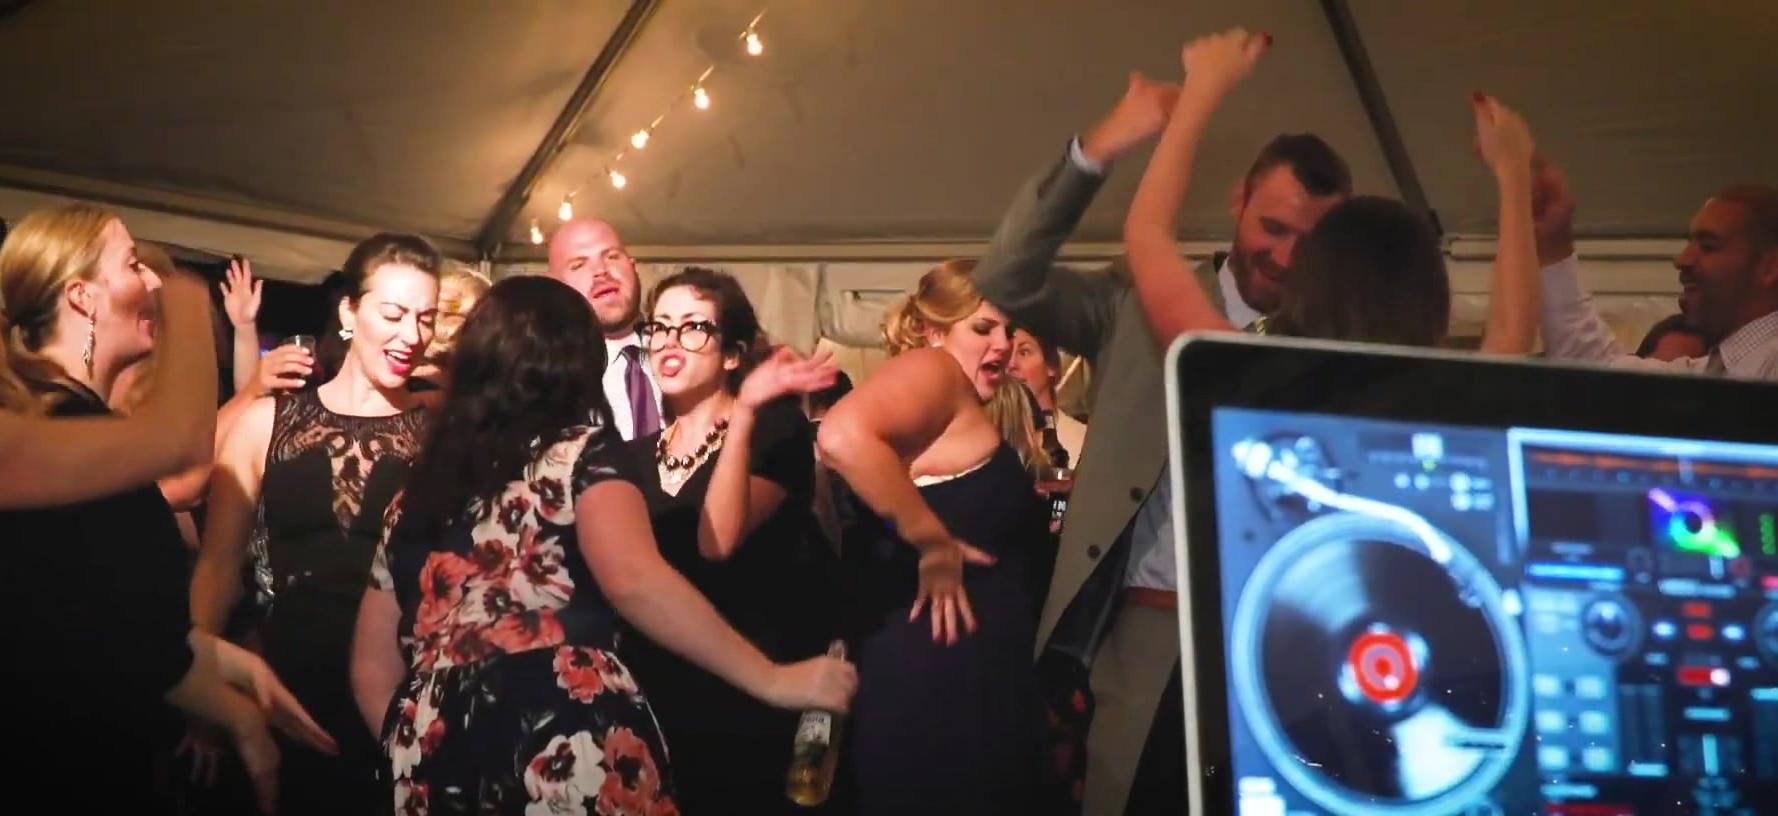 Bella + Steve Wedding dancing.mp4